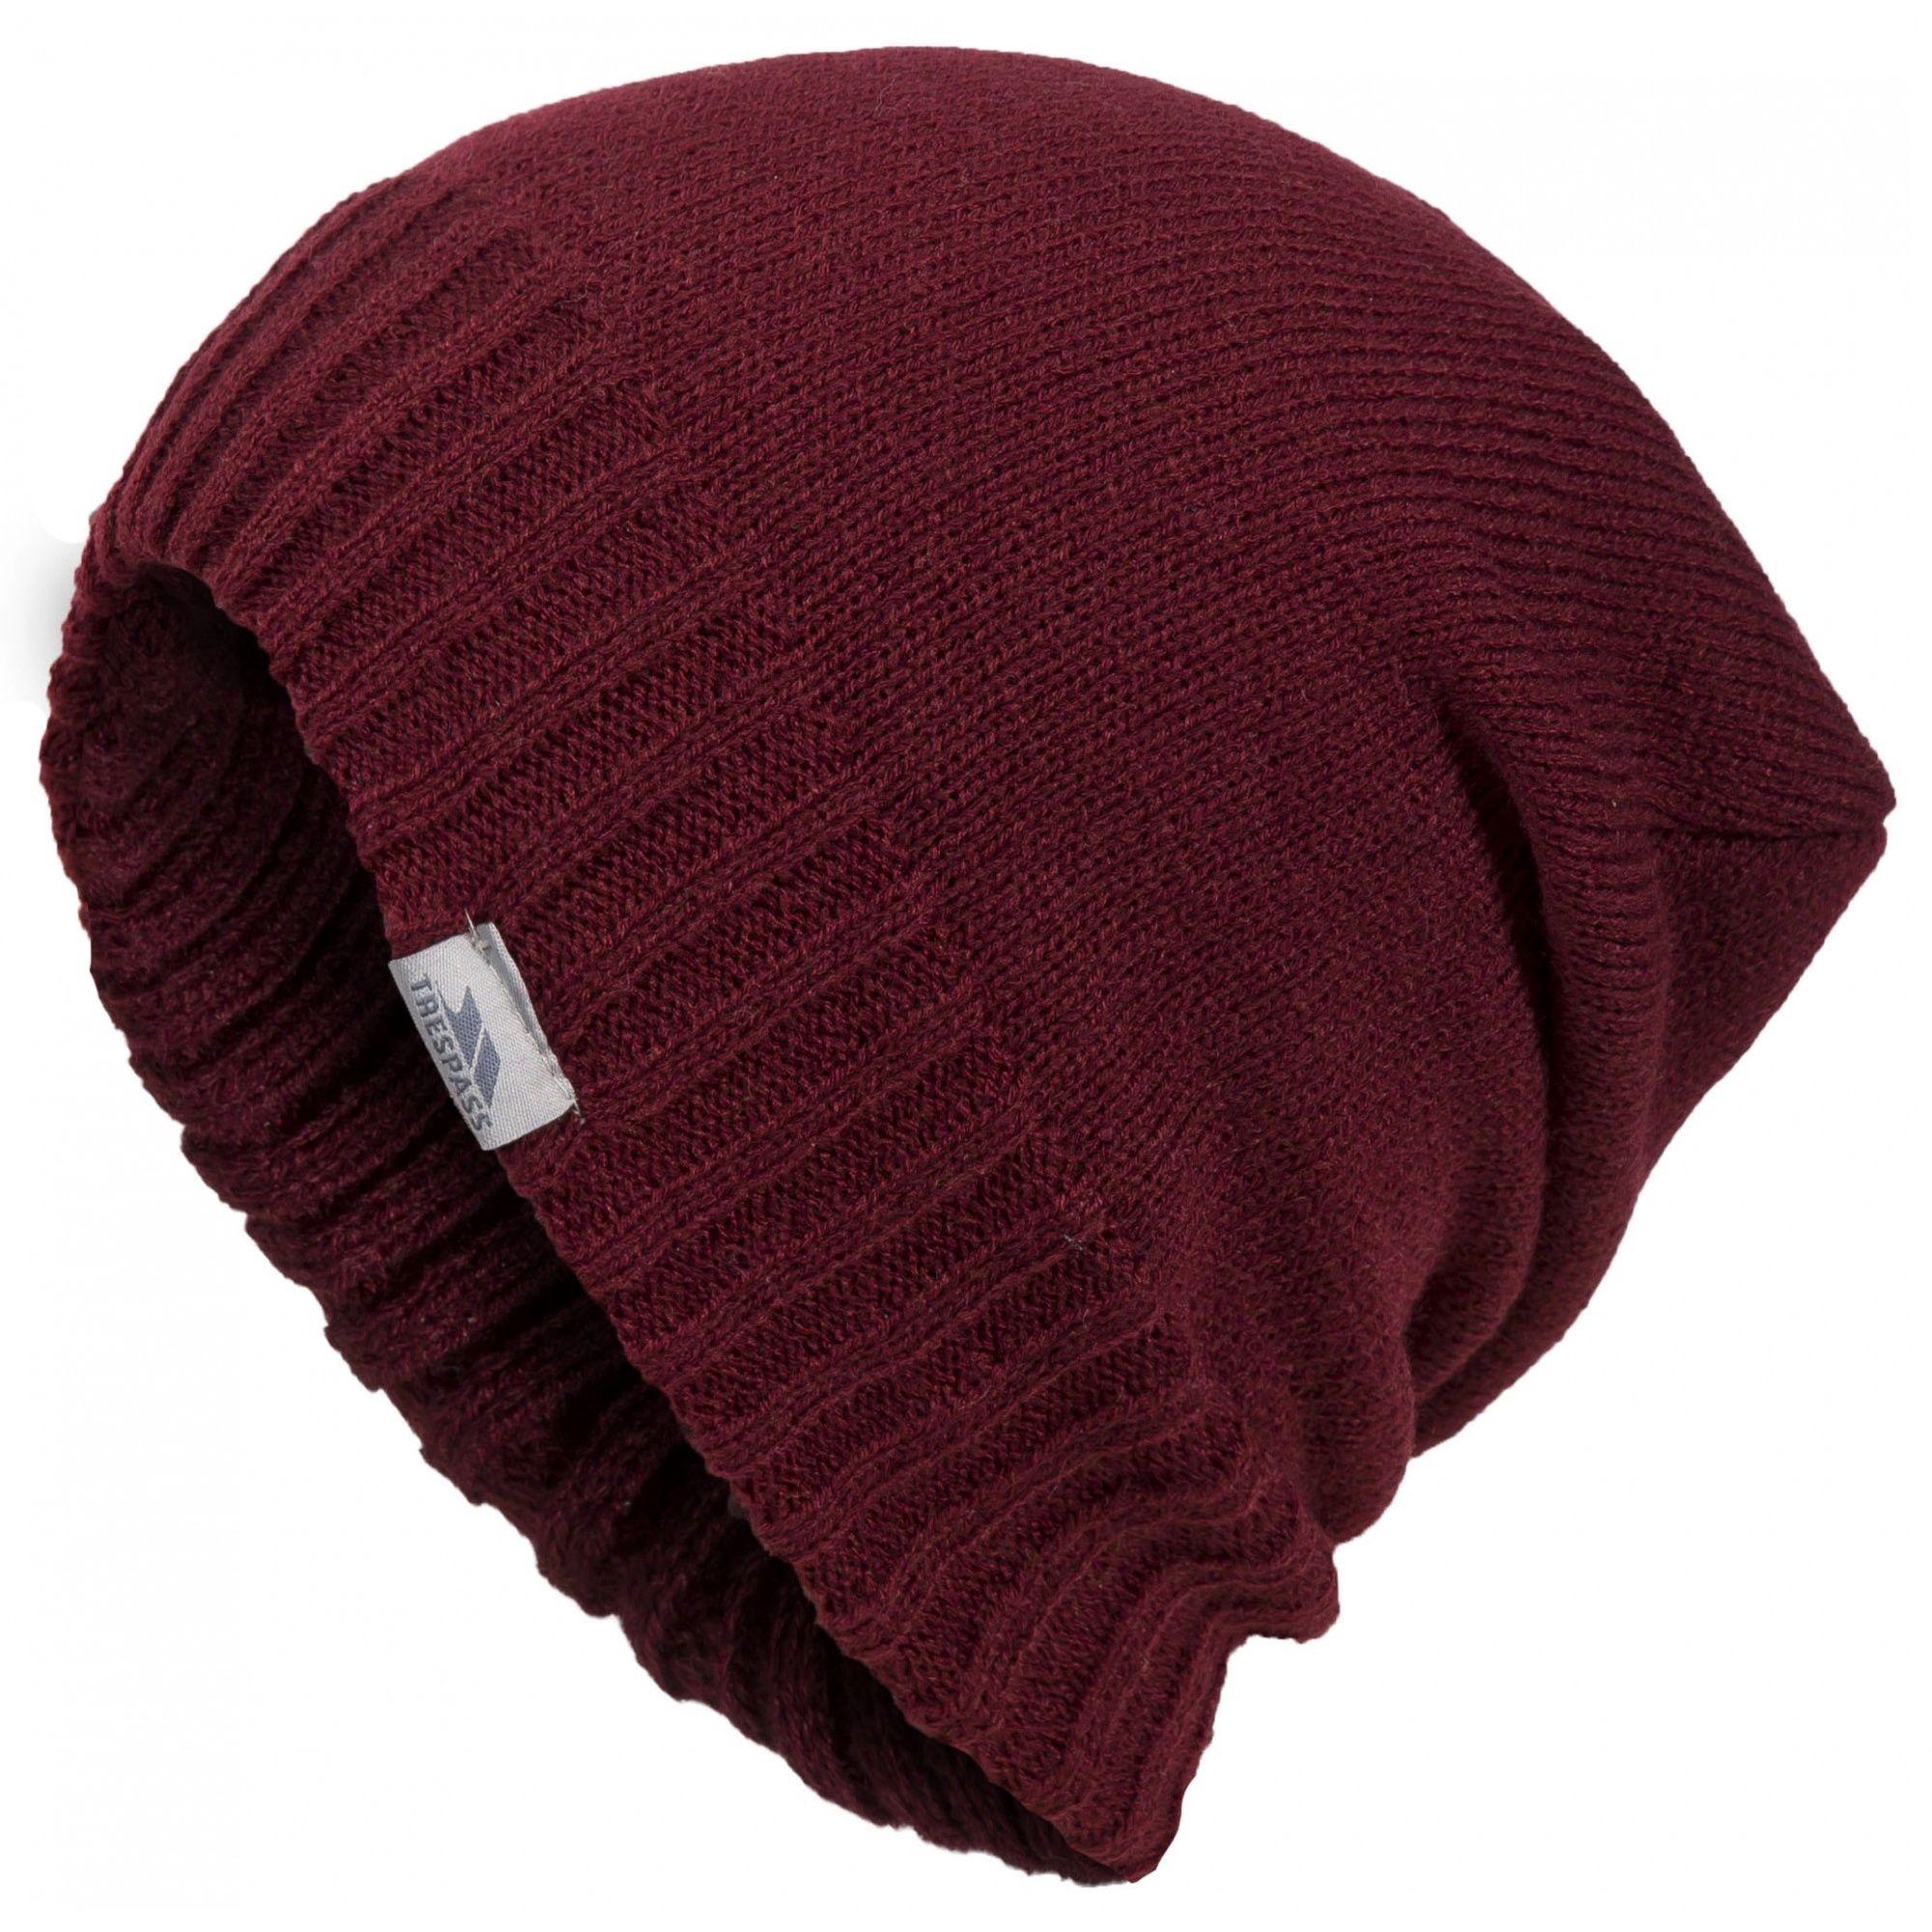 Trespass Unisex Ballard Winter Slouch Beanie Hat